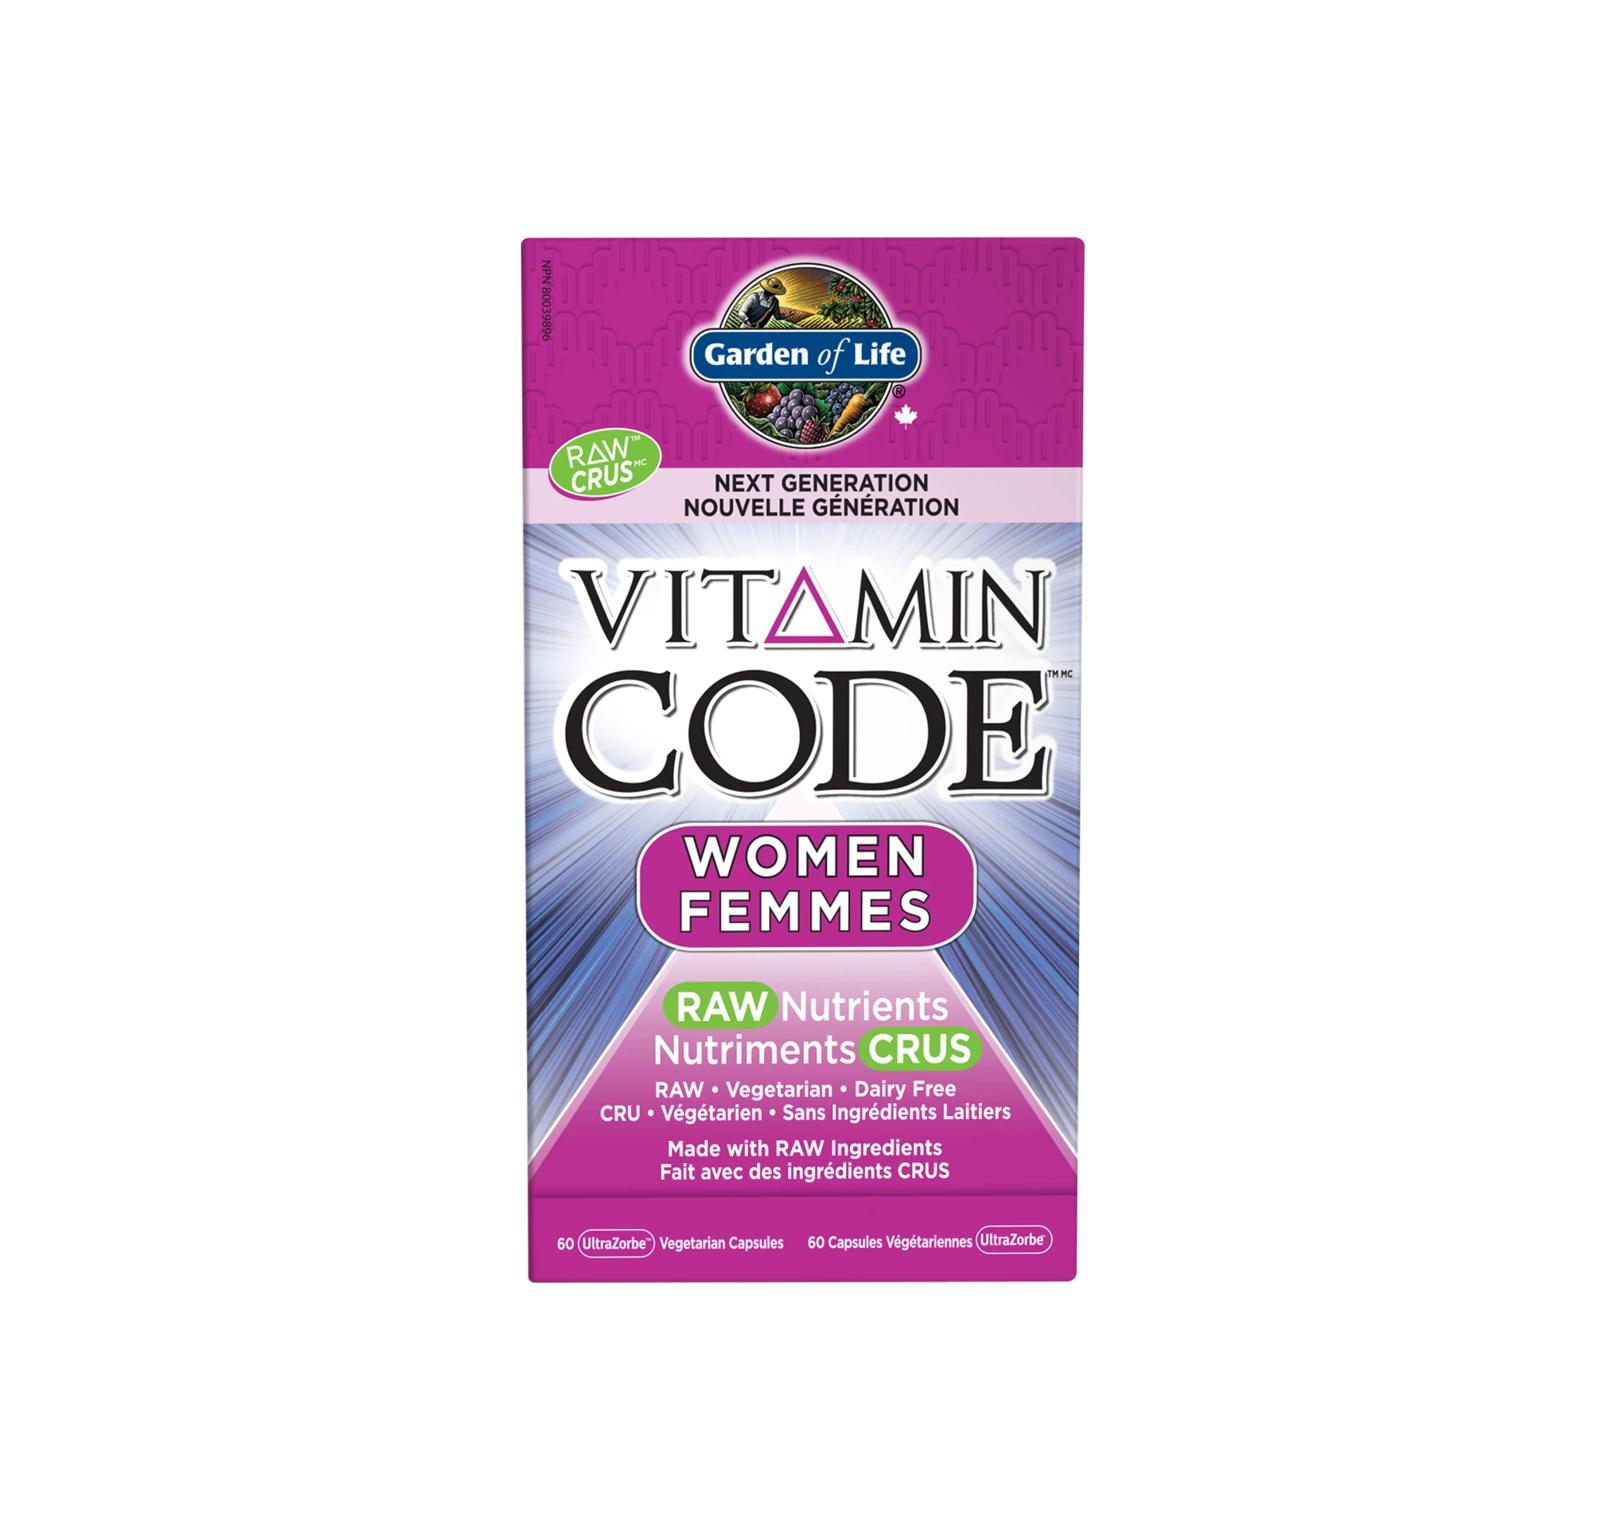 Garden of Life Vitamin Code Women Raw Nutrients 60 UltraZorbe Veggie Capsules